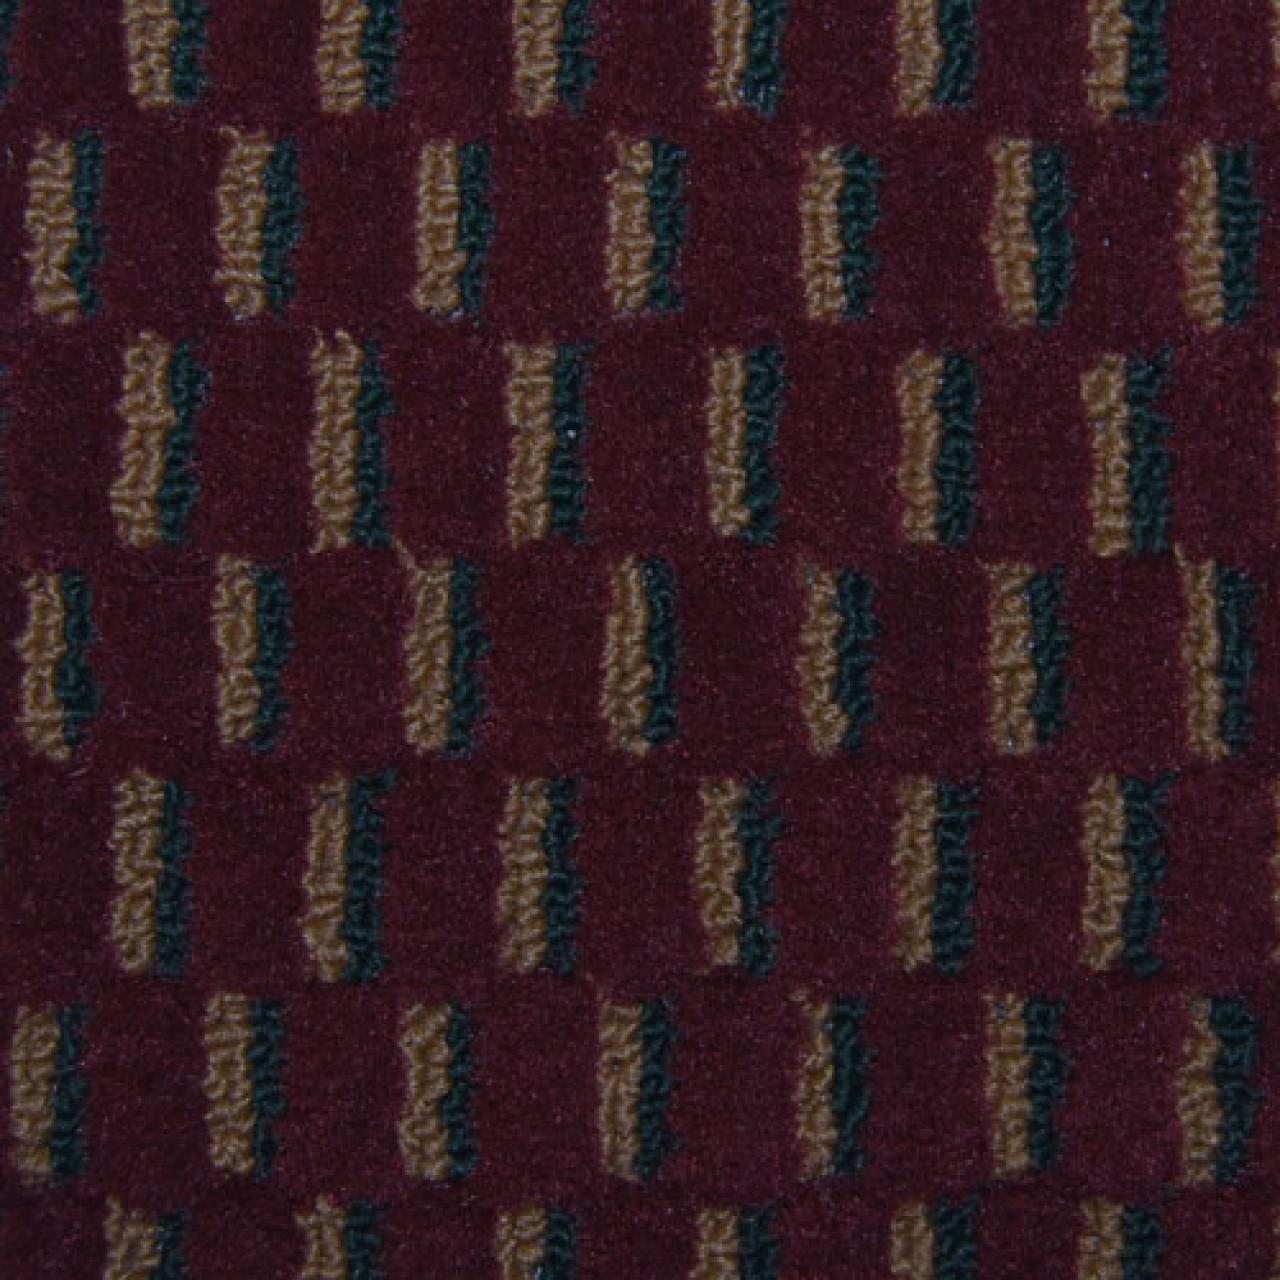 Buy Camelot Hotel Motel Carpet